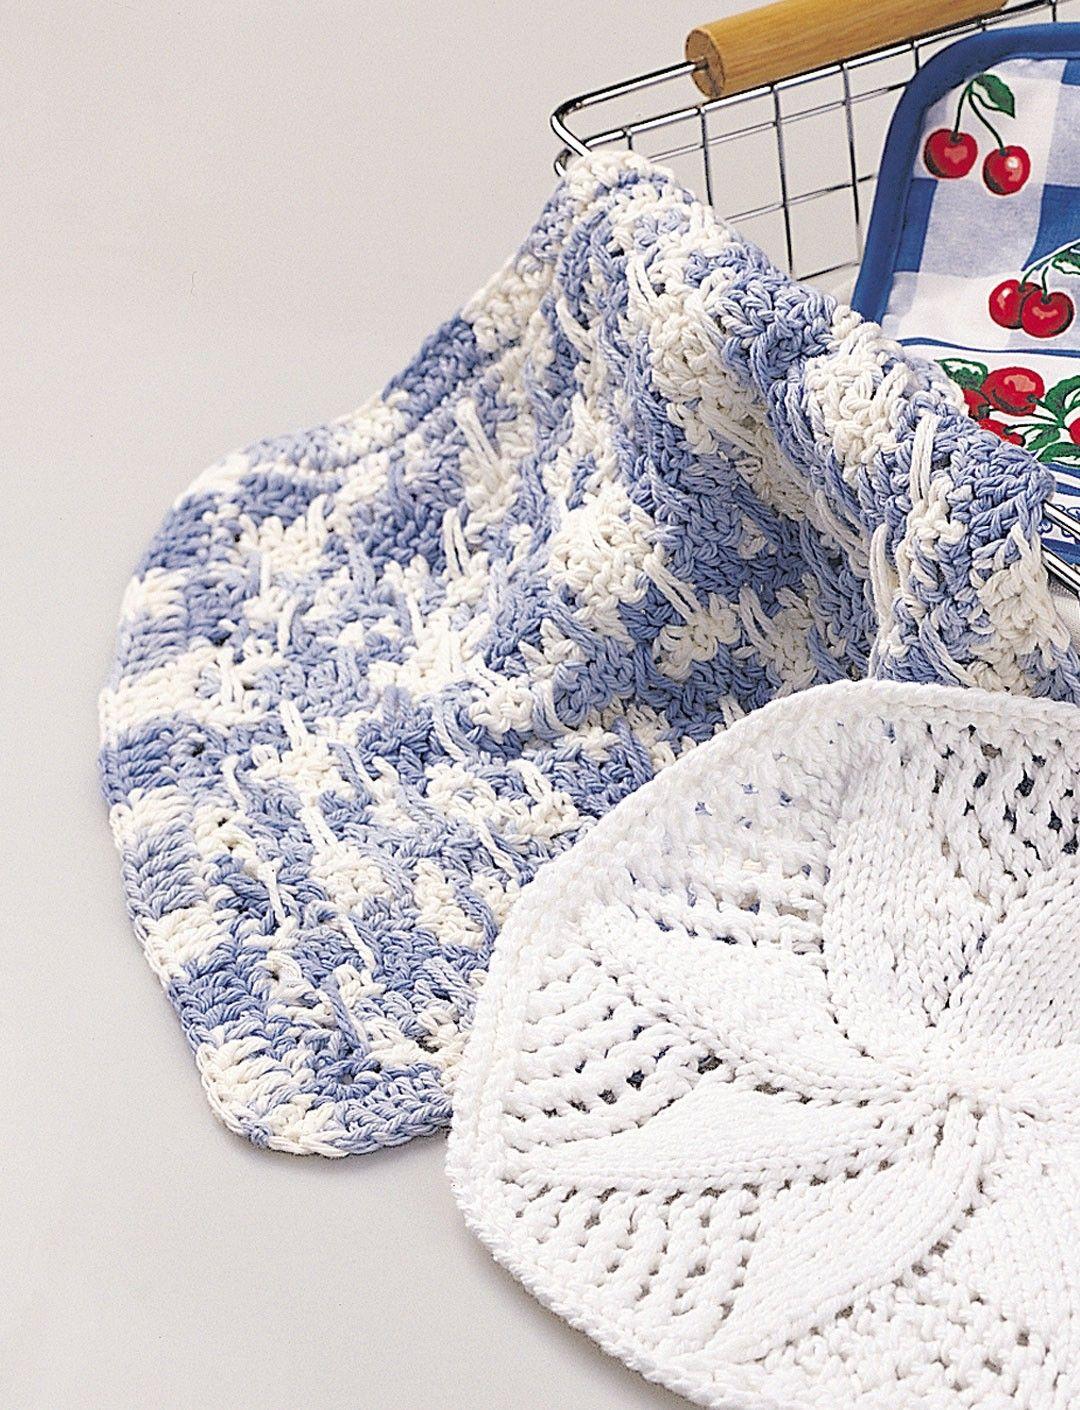 Yarnspirations.com - Lily Lacy Dishcloth - Patterns | Yarnspirations ...